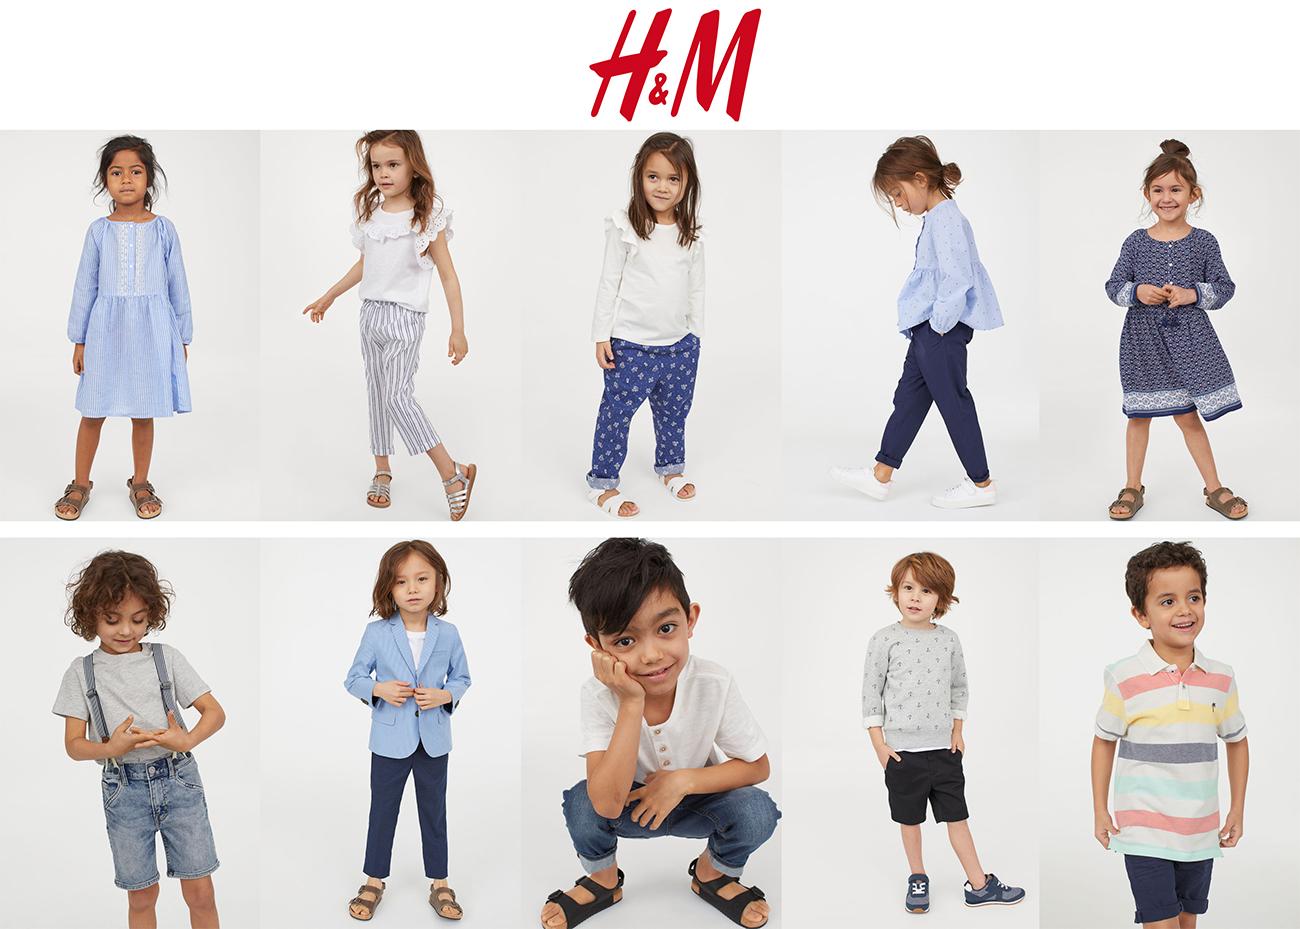 H&M Outfit Guide Bluebells Helen Rowan Photography